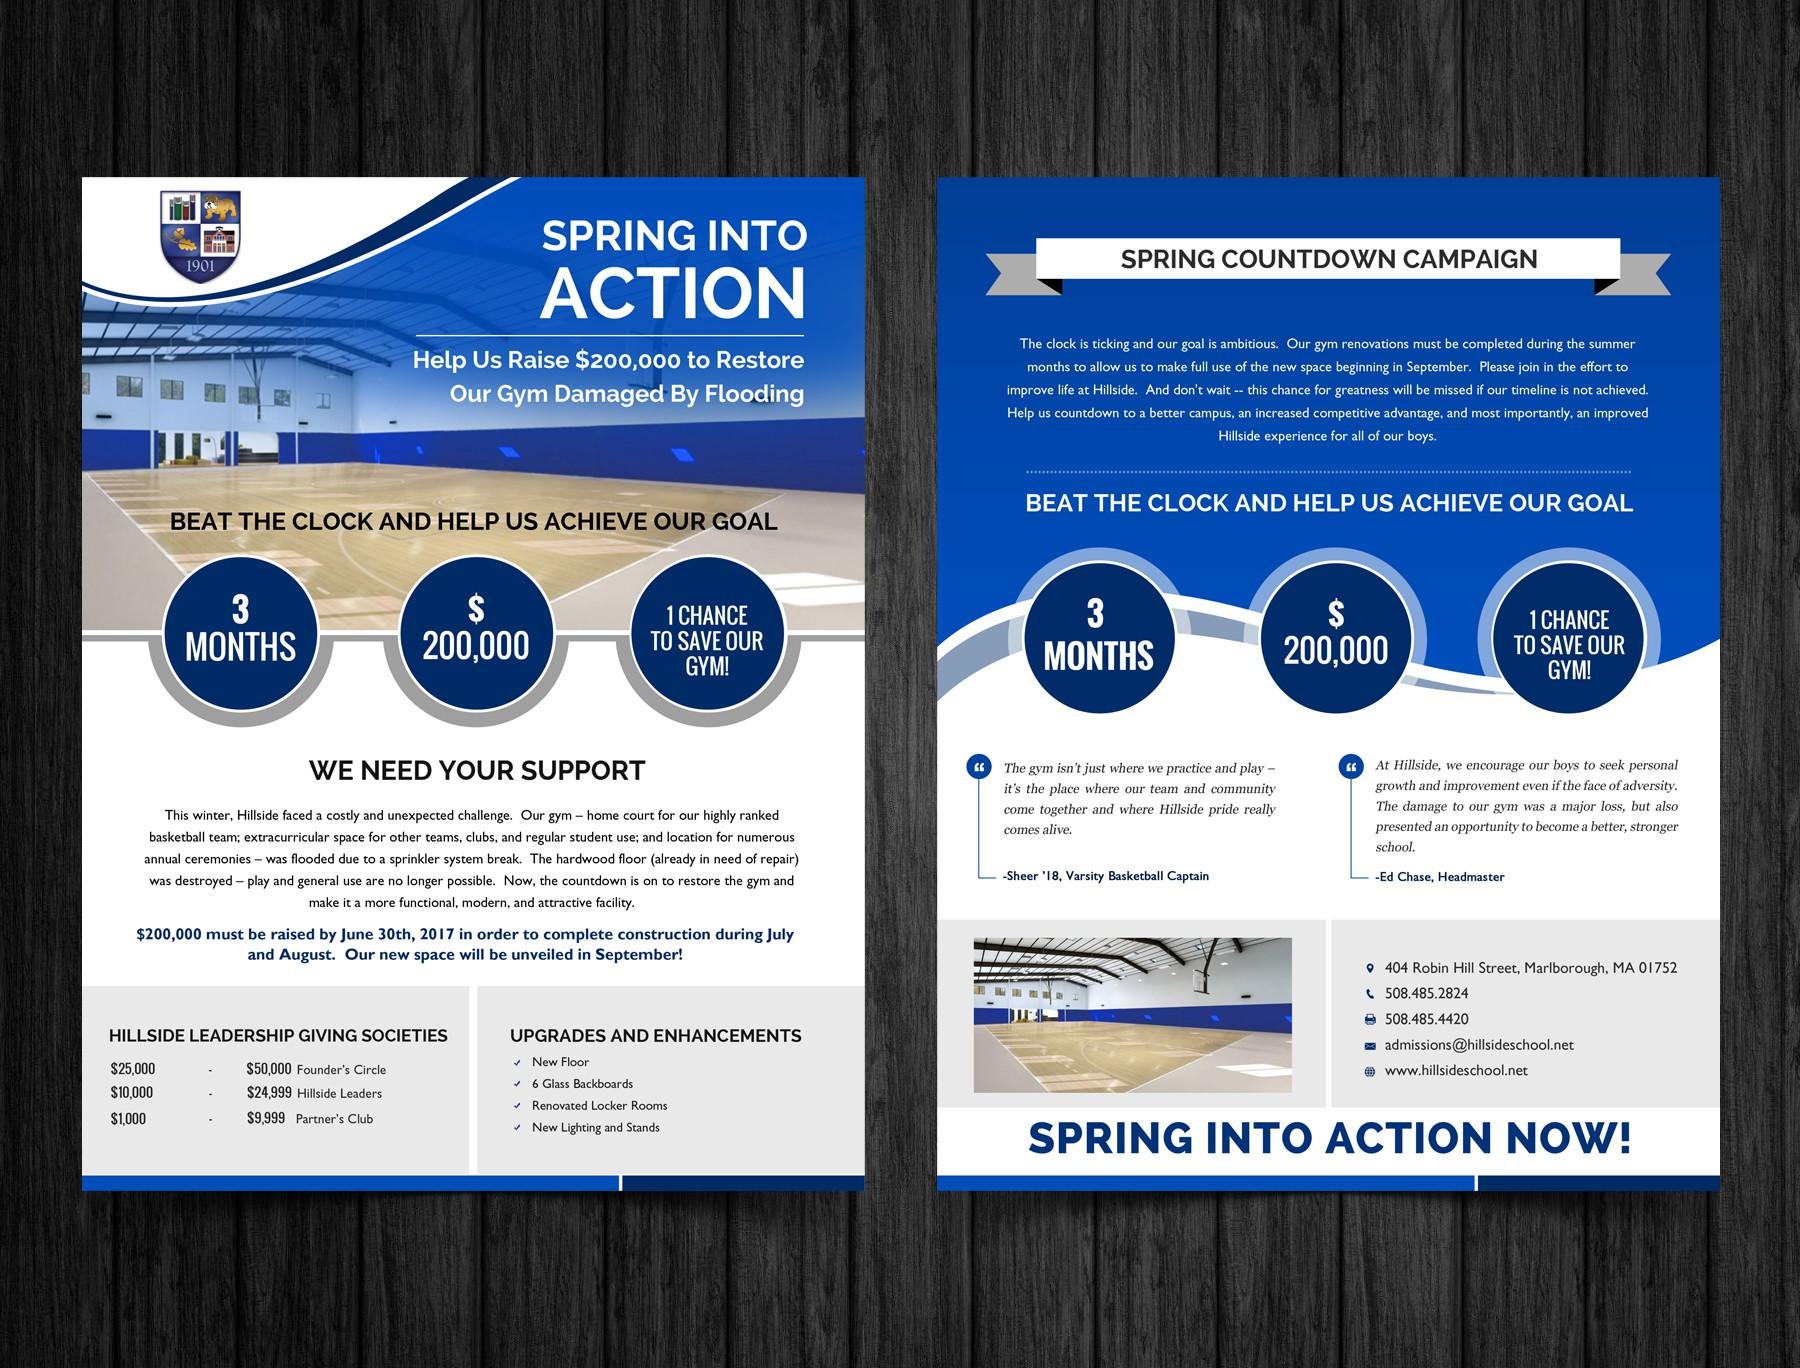 Hillside School Spring Countdown/New Gym Campaign Brochure